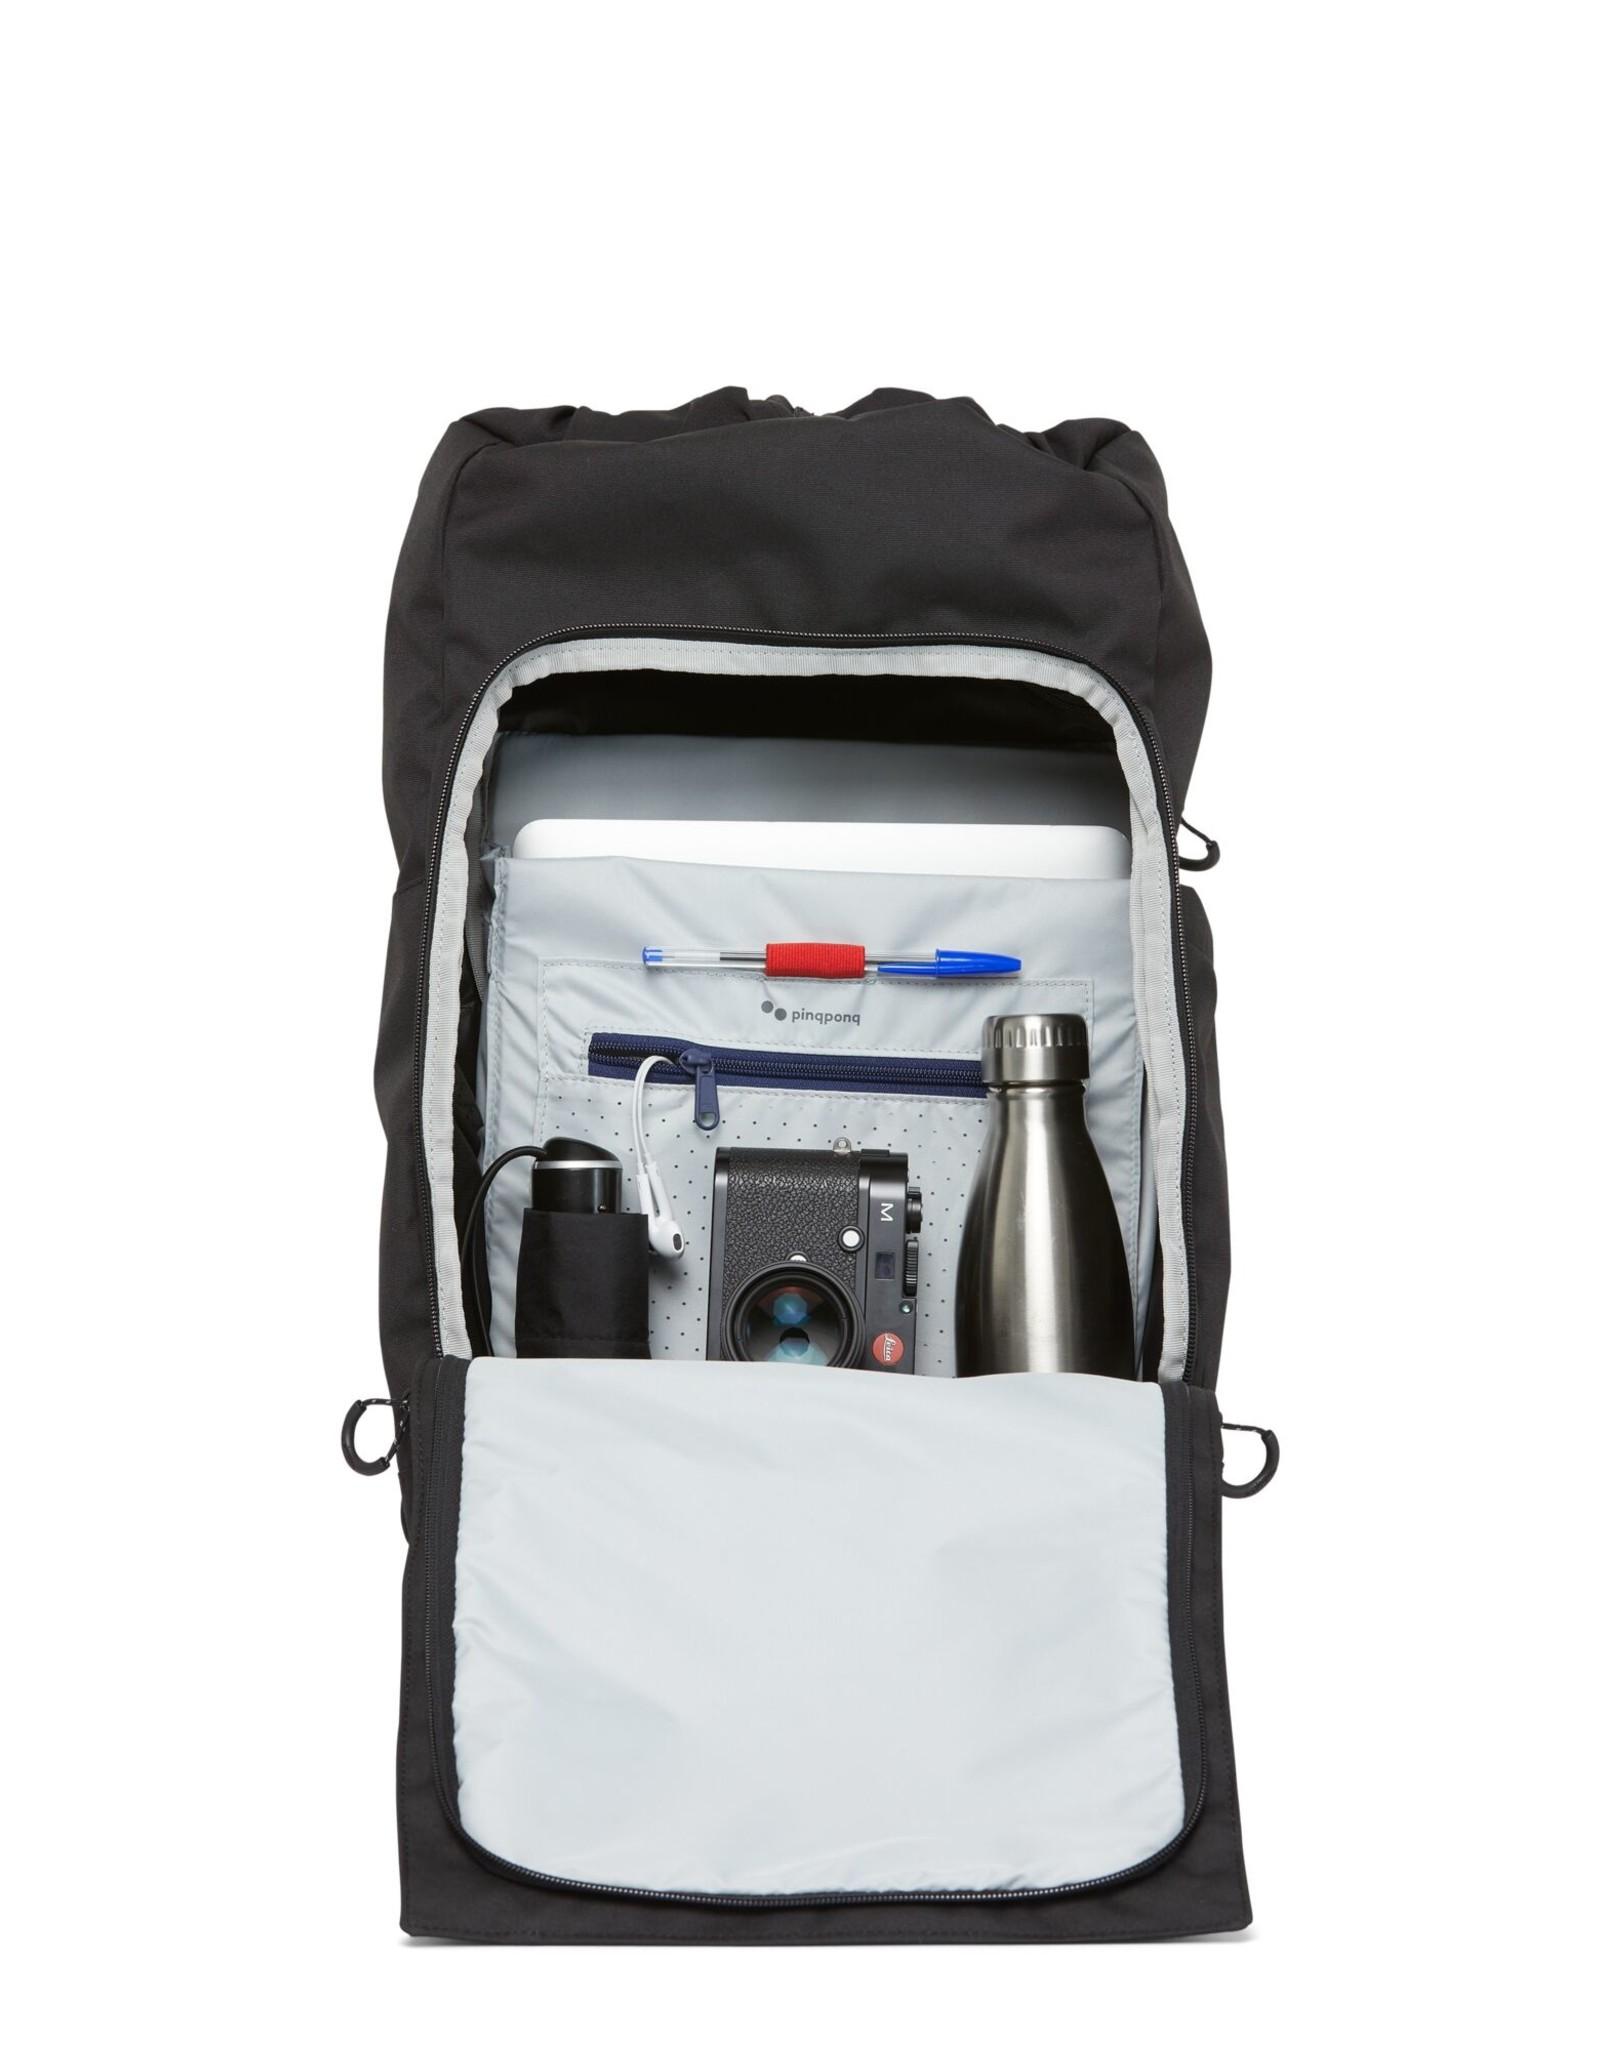 pinqponq KALM Backpack